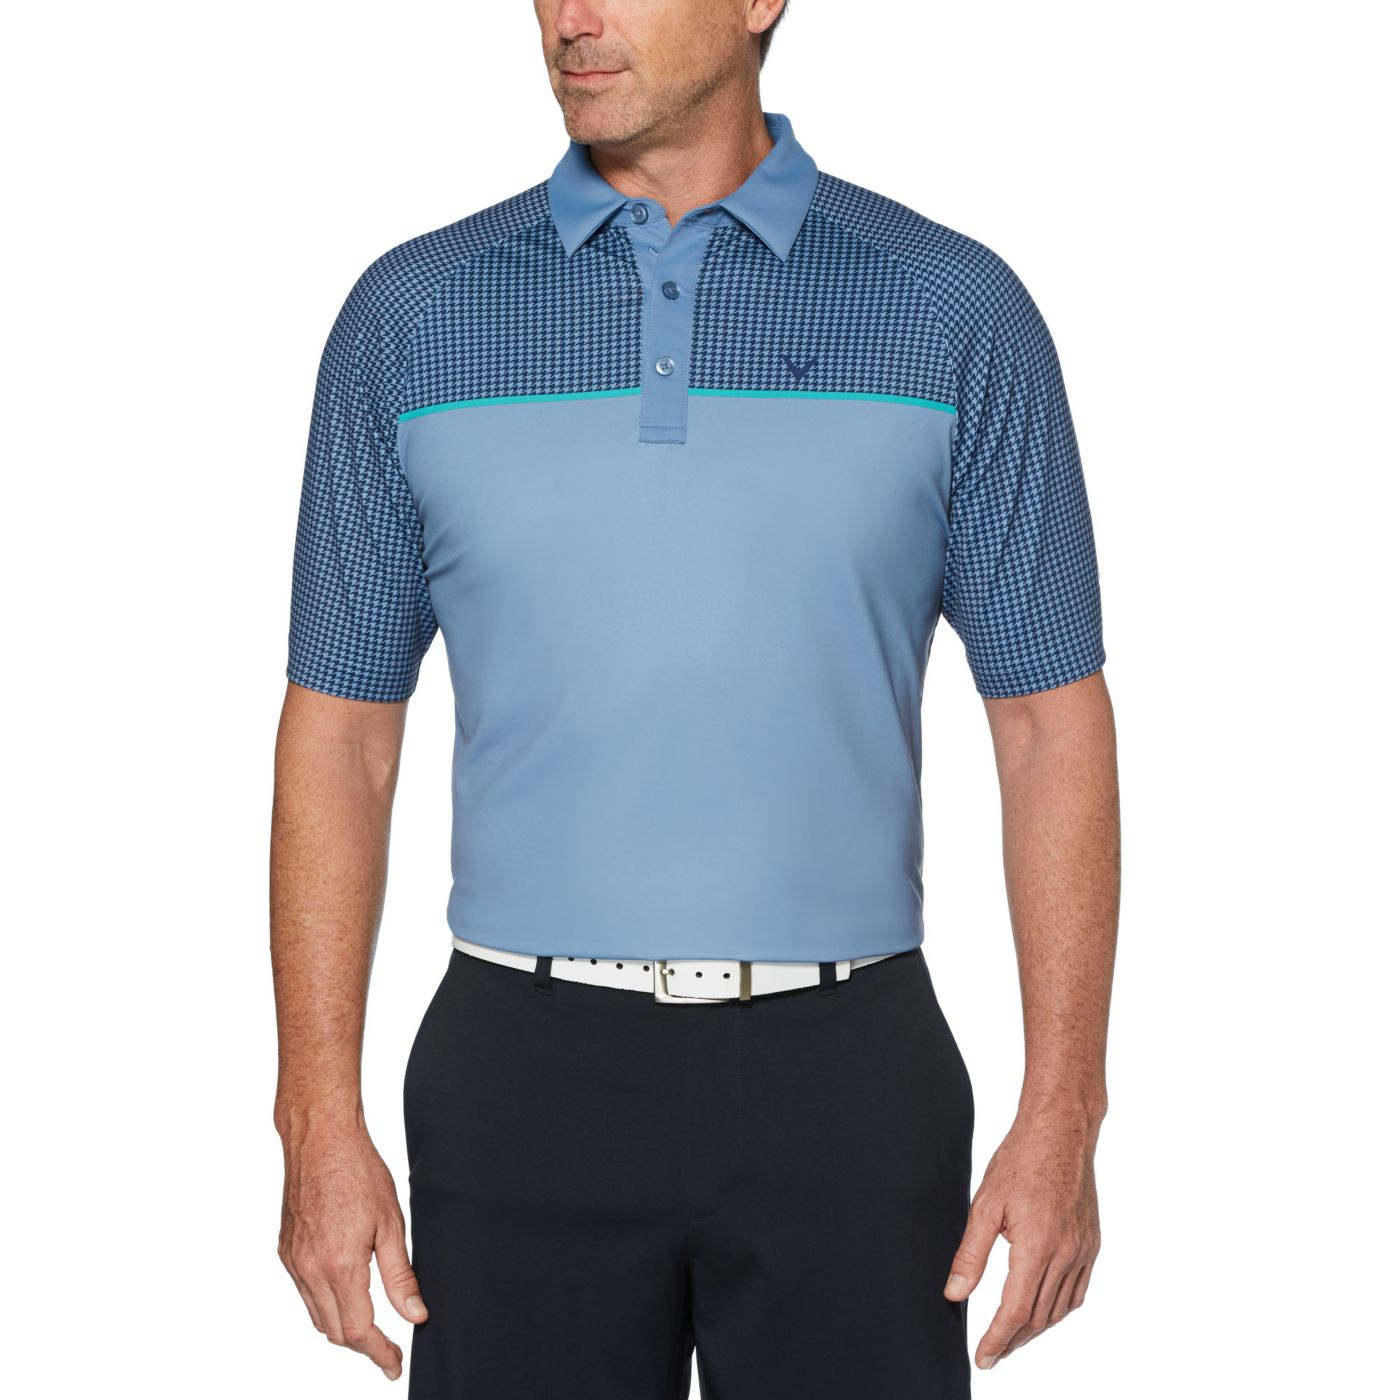 Callaway Men's Houndstooth Print Golf Polo